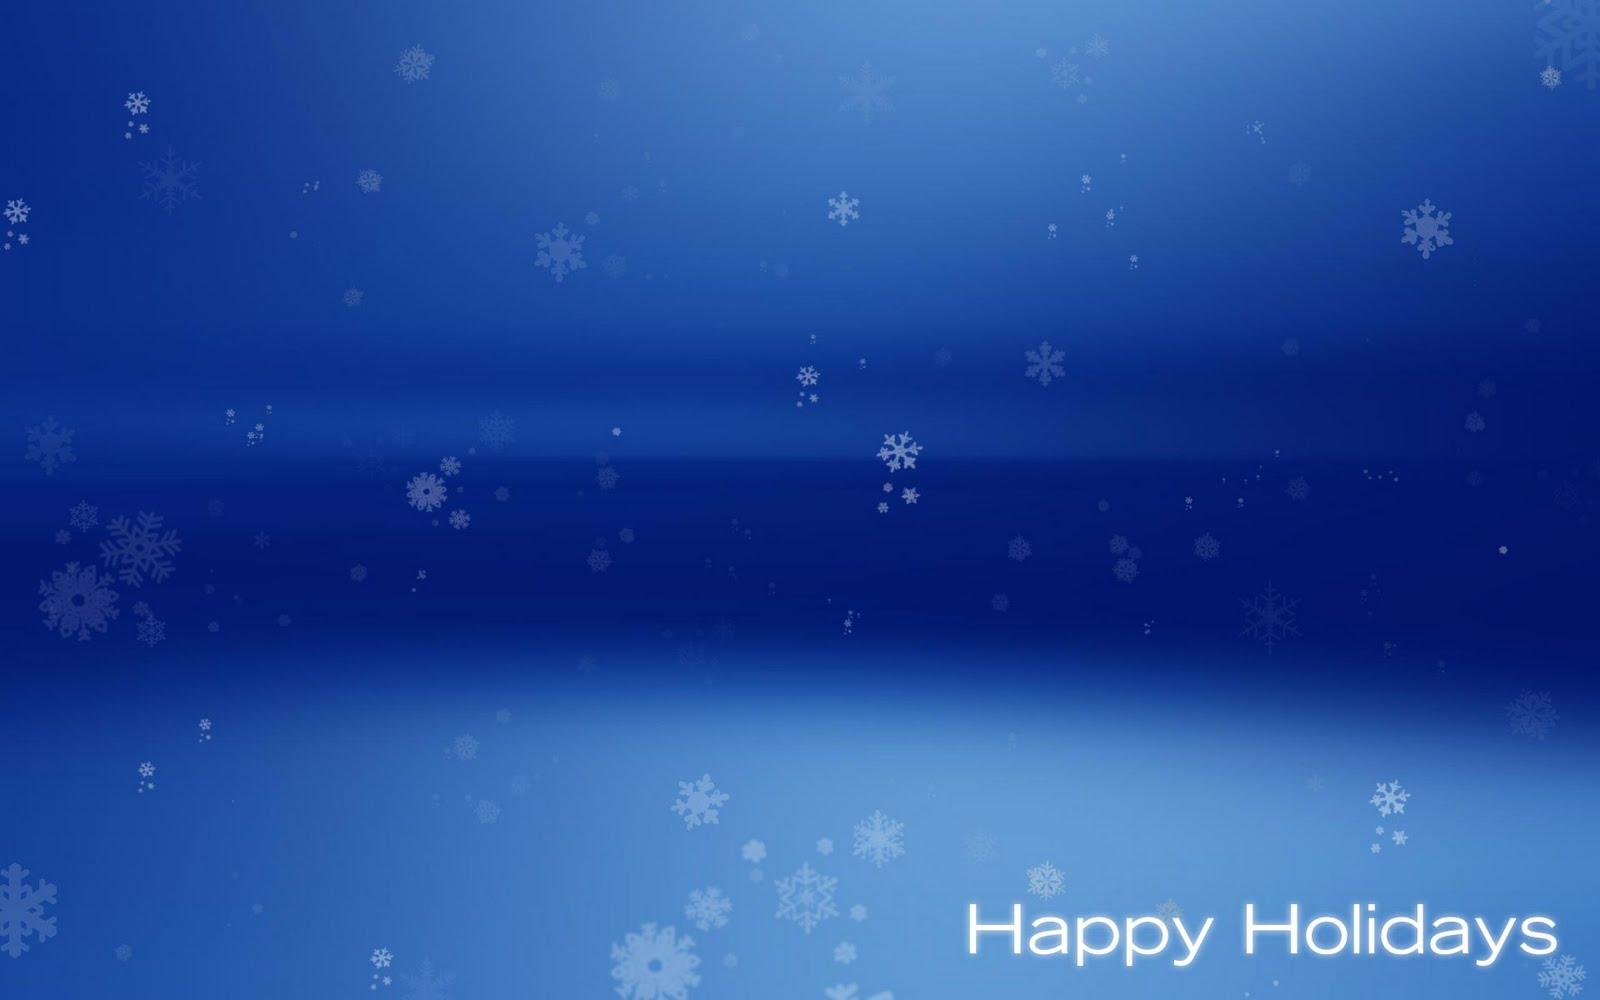 merry christmas powerpoint backgrounds | desktop background wallpapers, Powerpoint templates